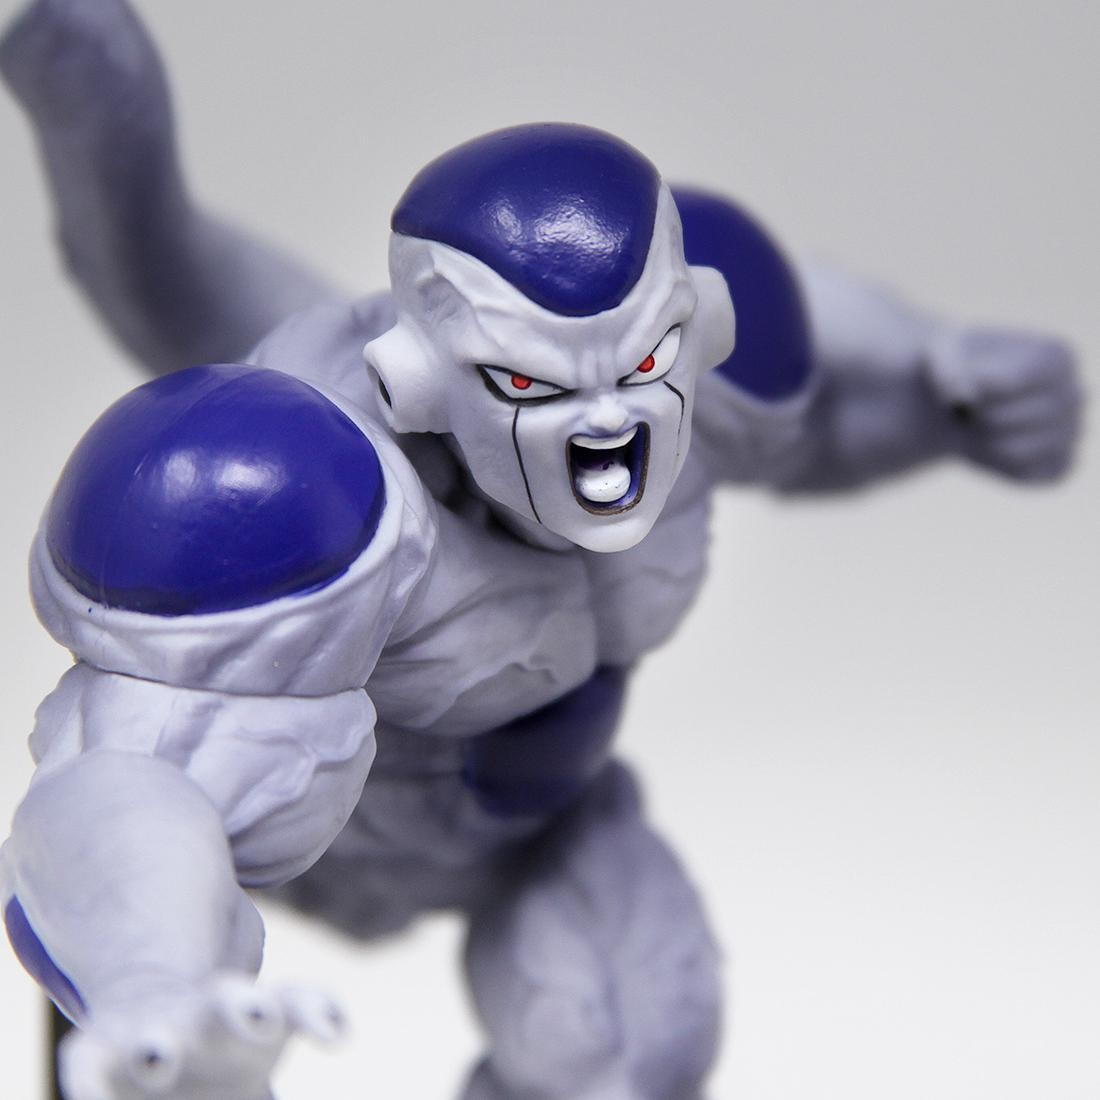 Banpresto The Movie Dragon Ball Super Broly SCultures The TAG Team Frieza Z-Battle Figure